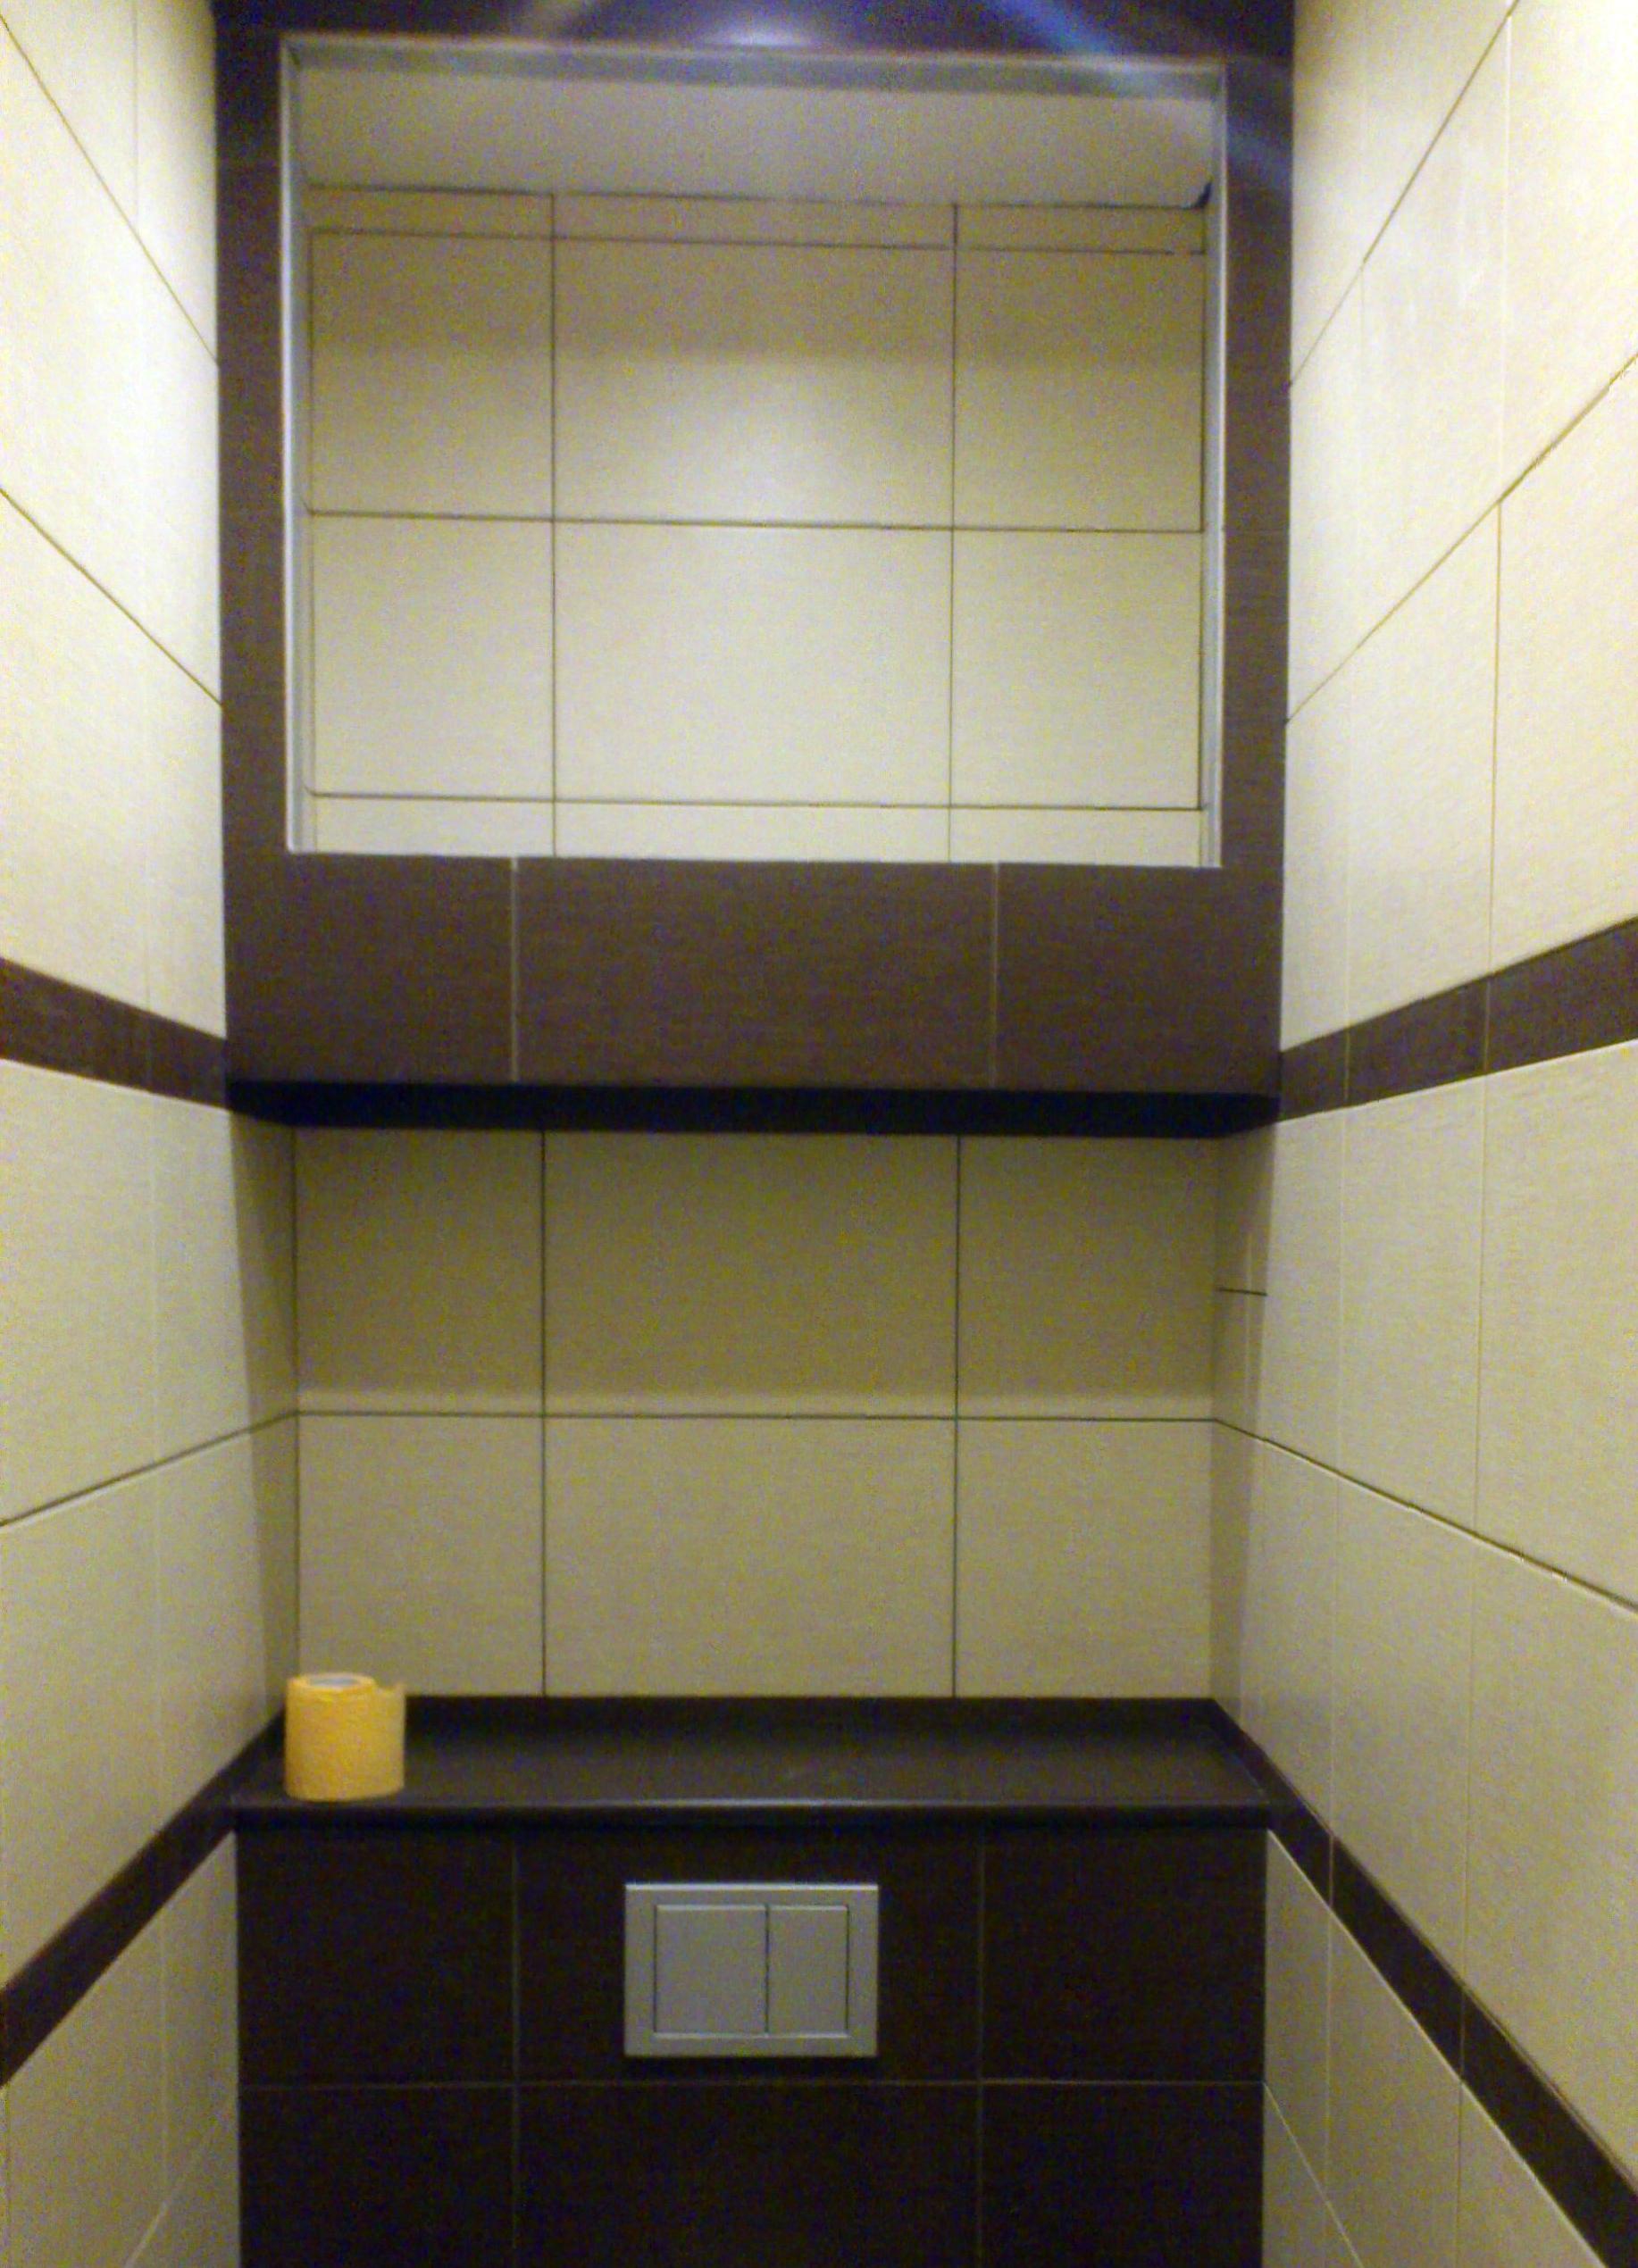 Шкаф за унитазом своими руками фото 269